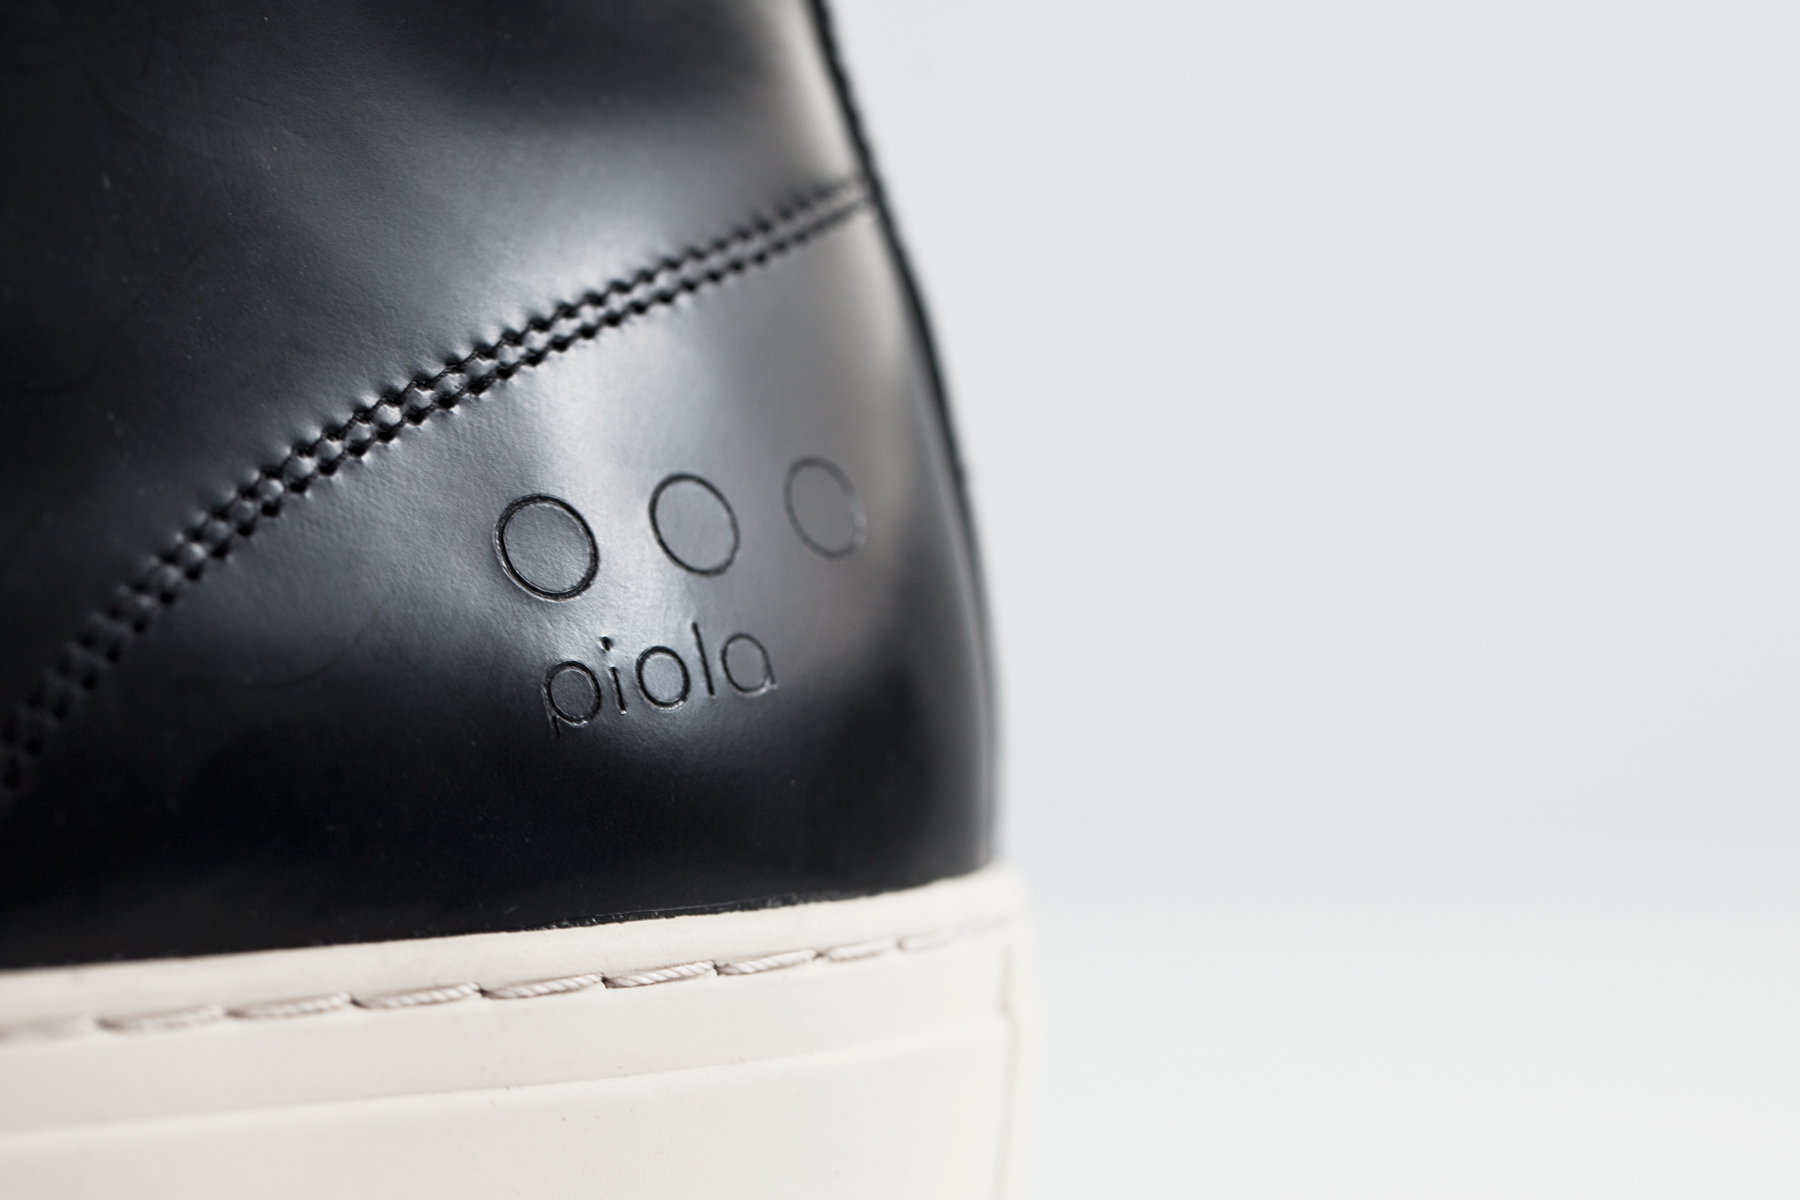 Piola 2014 Iberia Sneakers